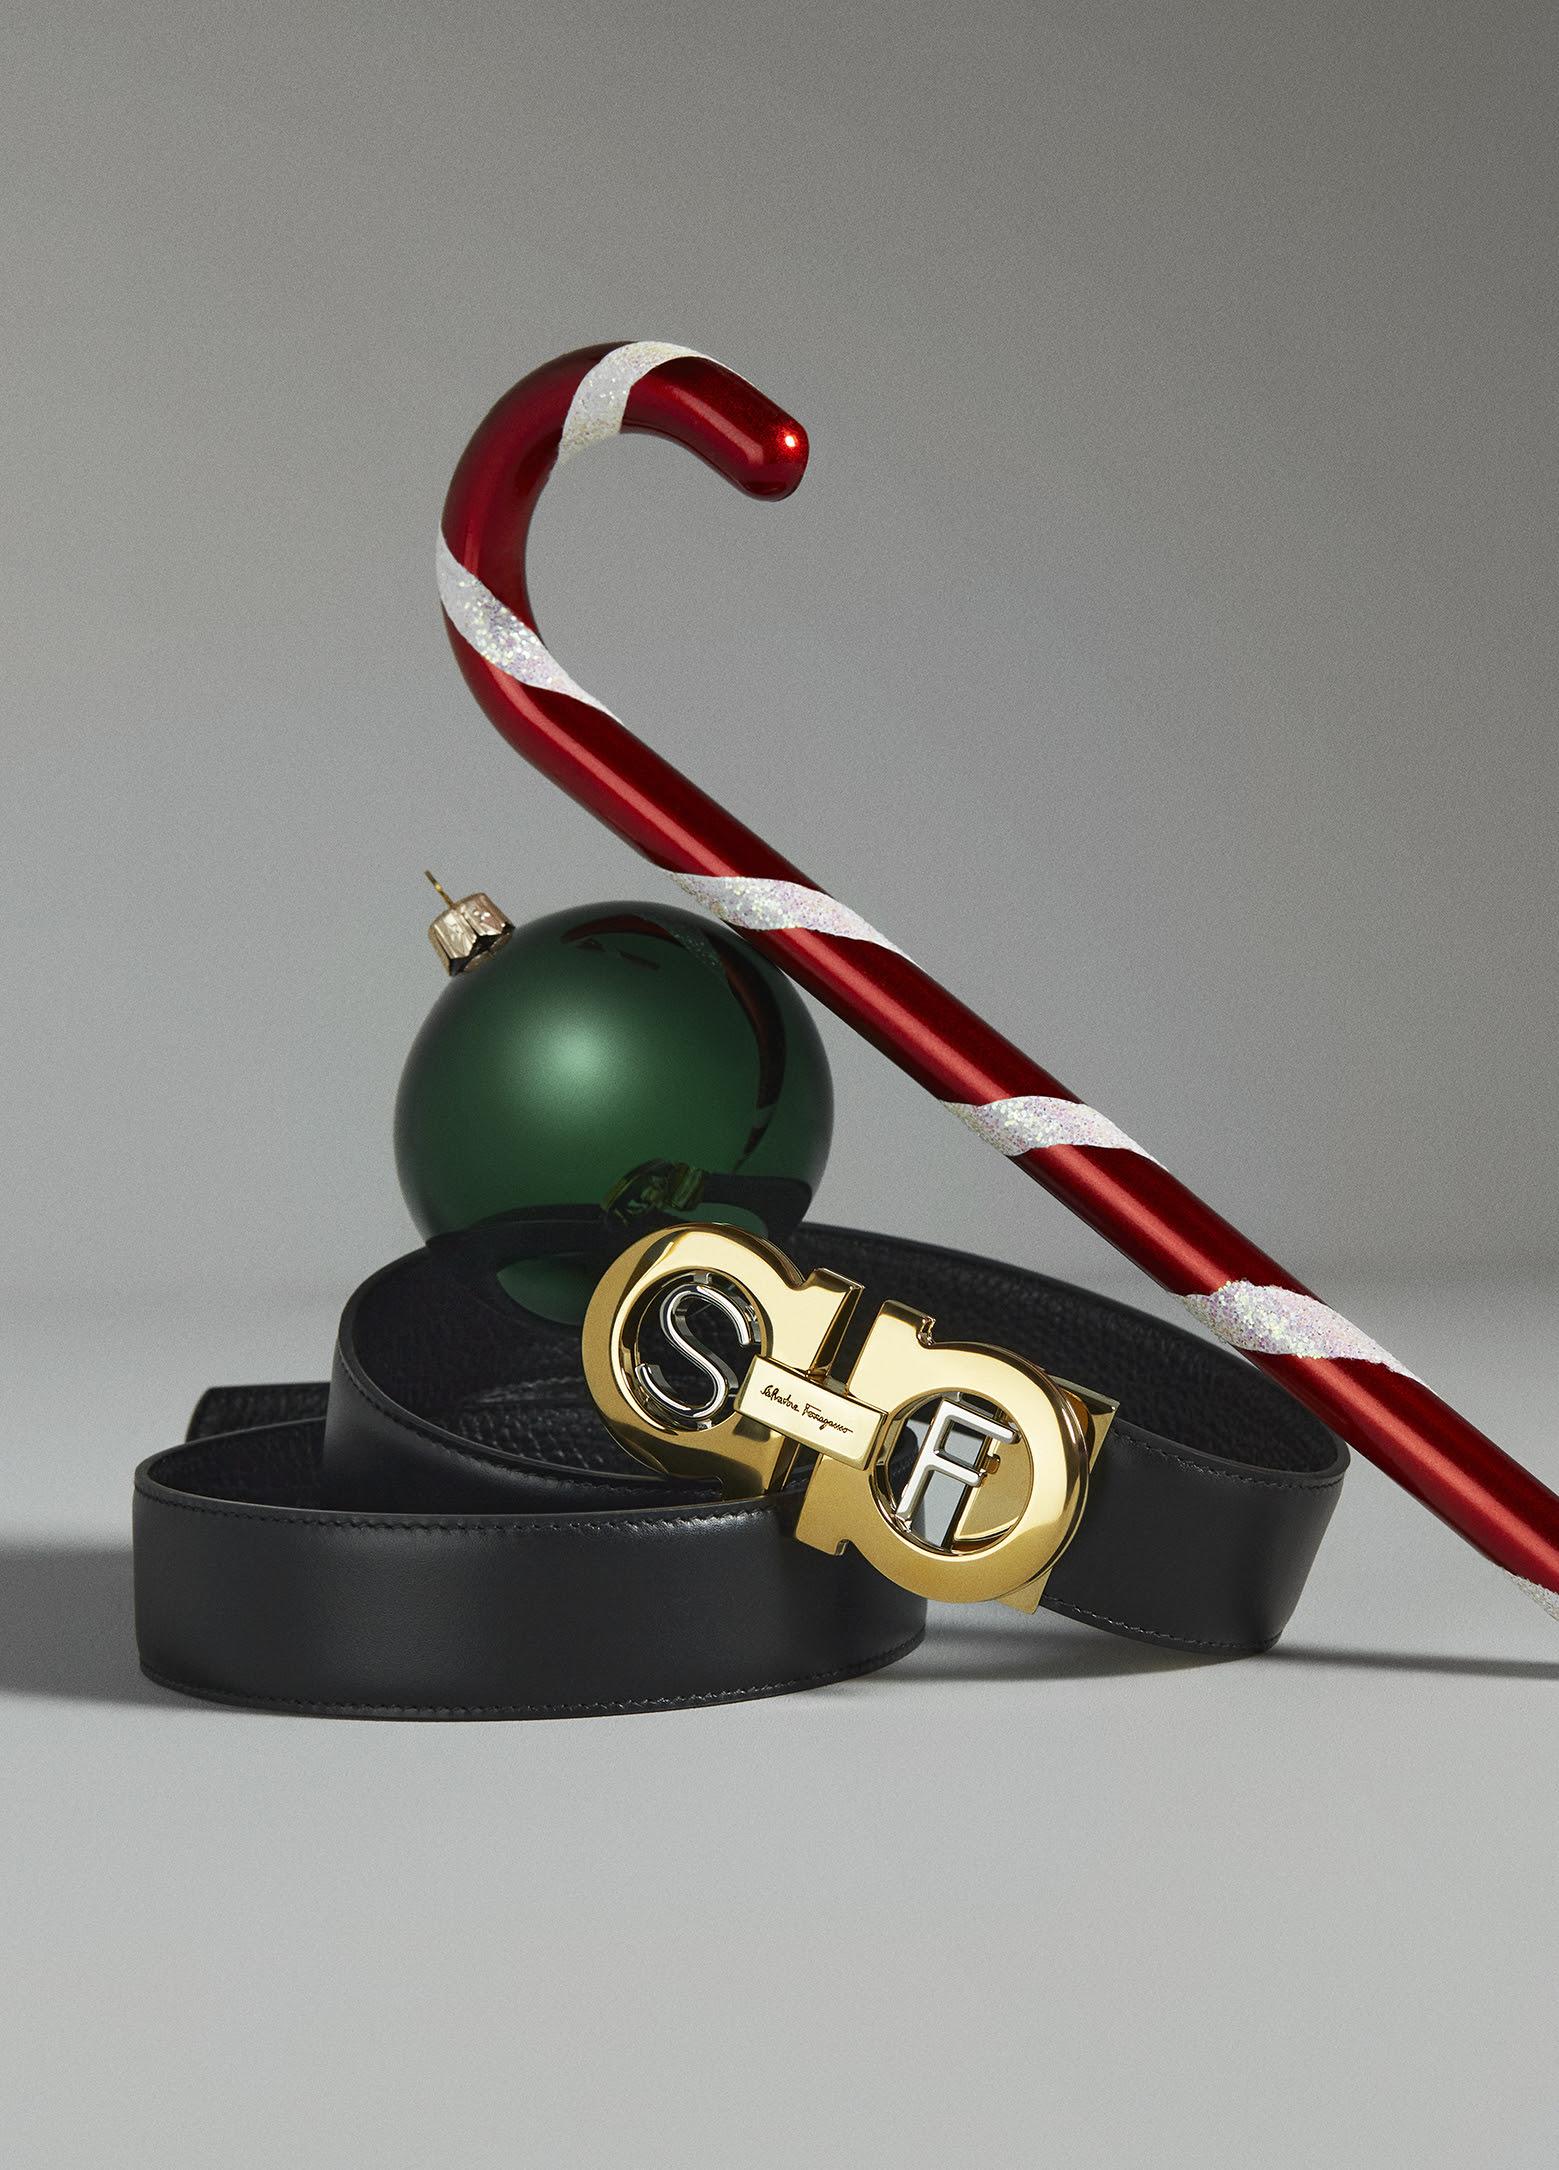 99f2619c 77a4 4574 a2a0 b325e0414231 - Salvatore Ferragamo presenta su colección Holiday 2020